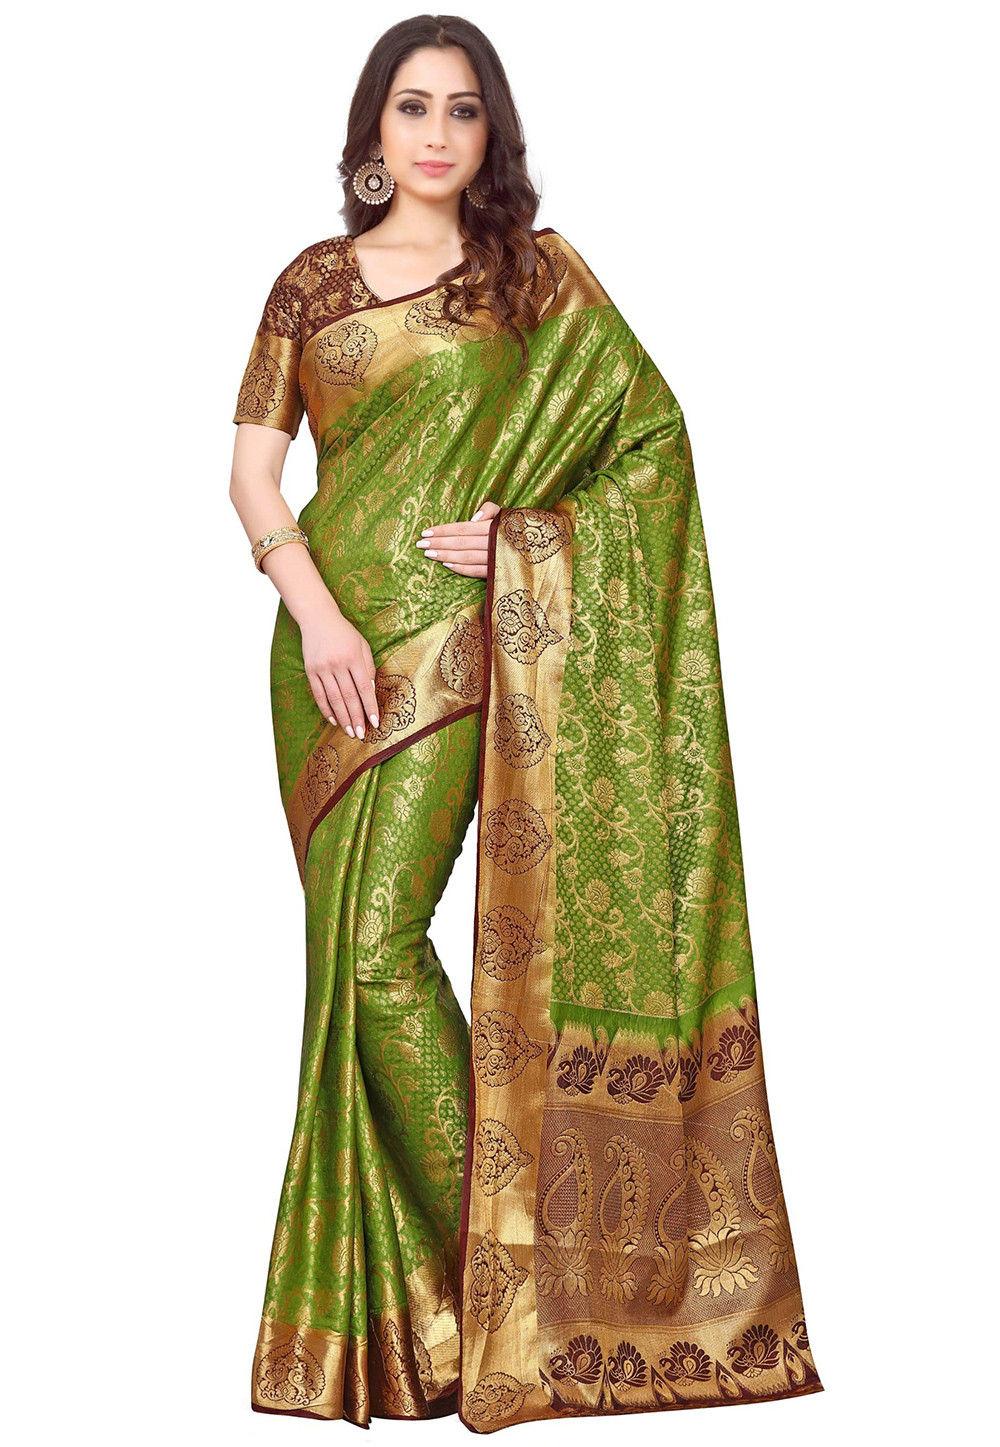 Kanchipuram Silk Saree in Olive Green